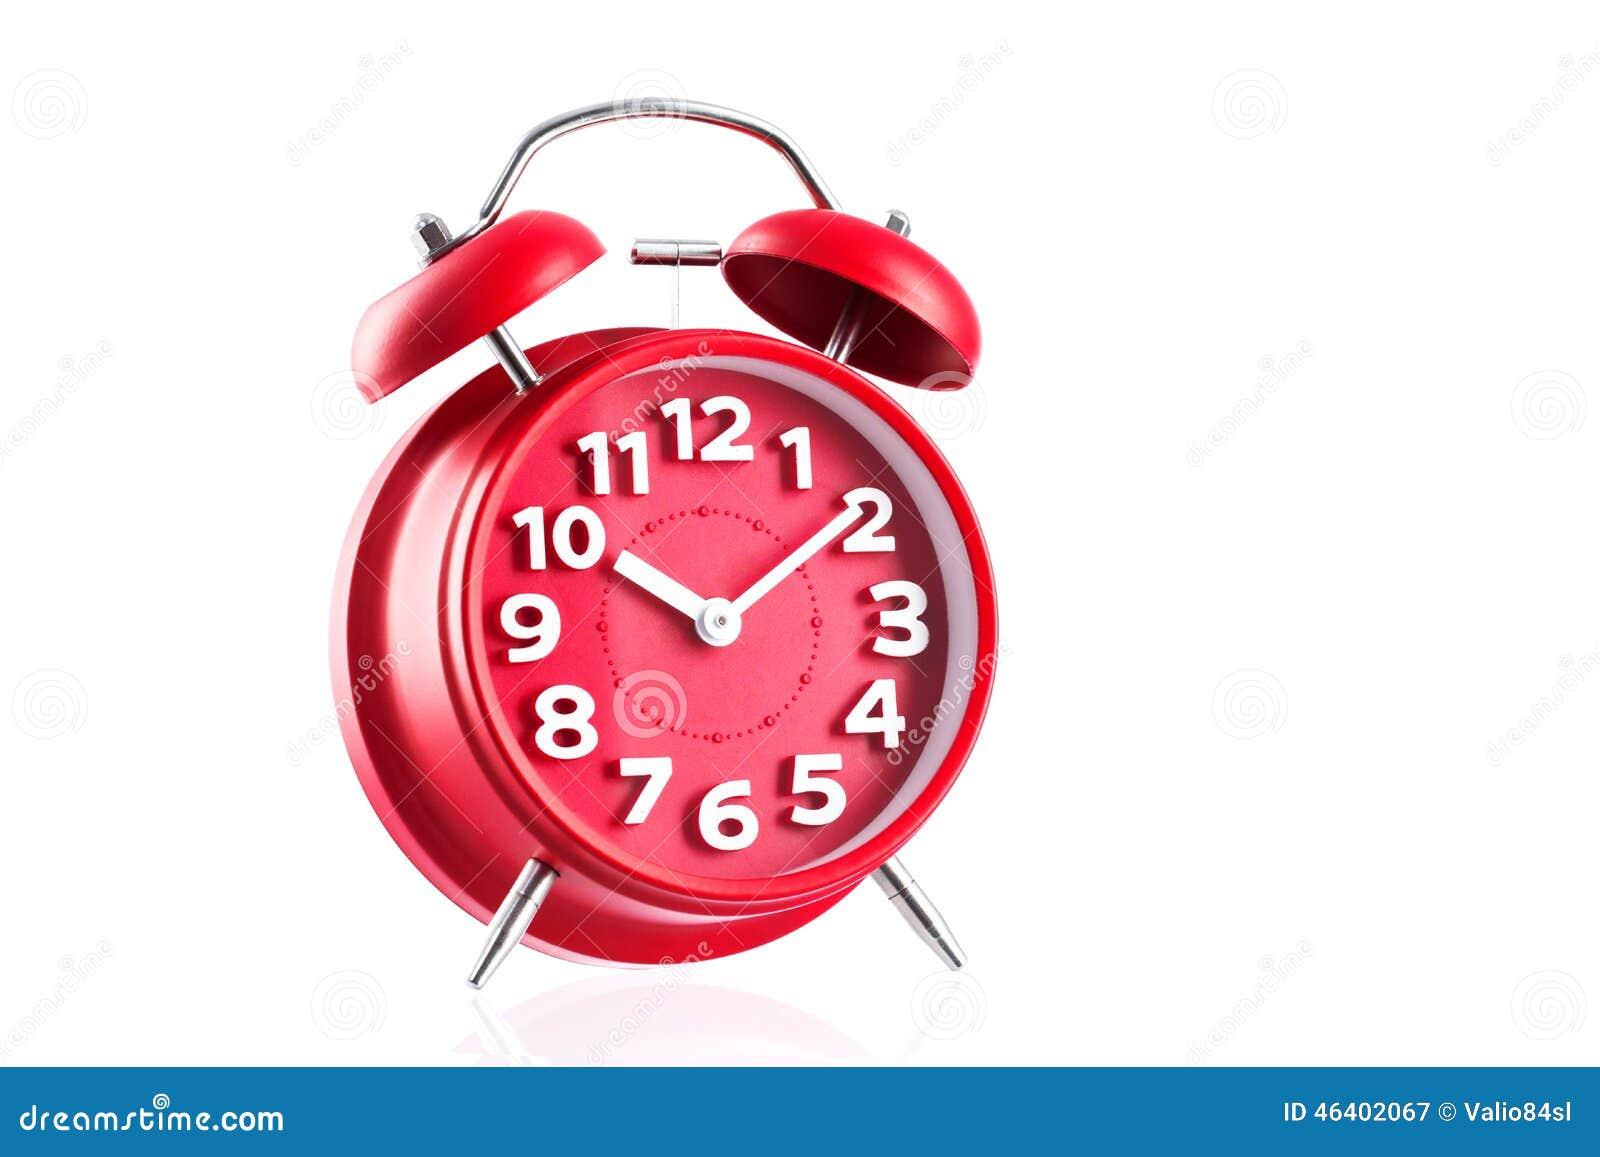 Red Alarm Clock Studio Isolated On White Background Stock ...